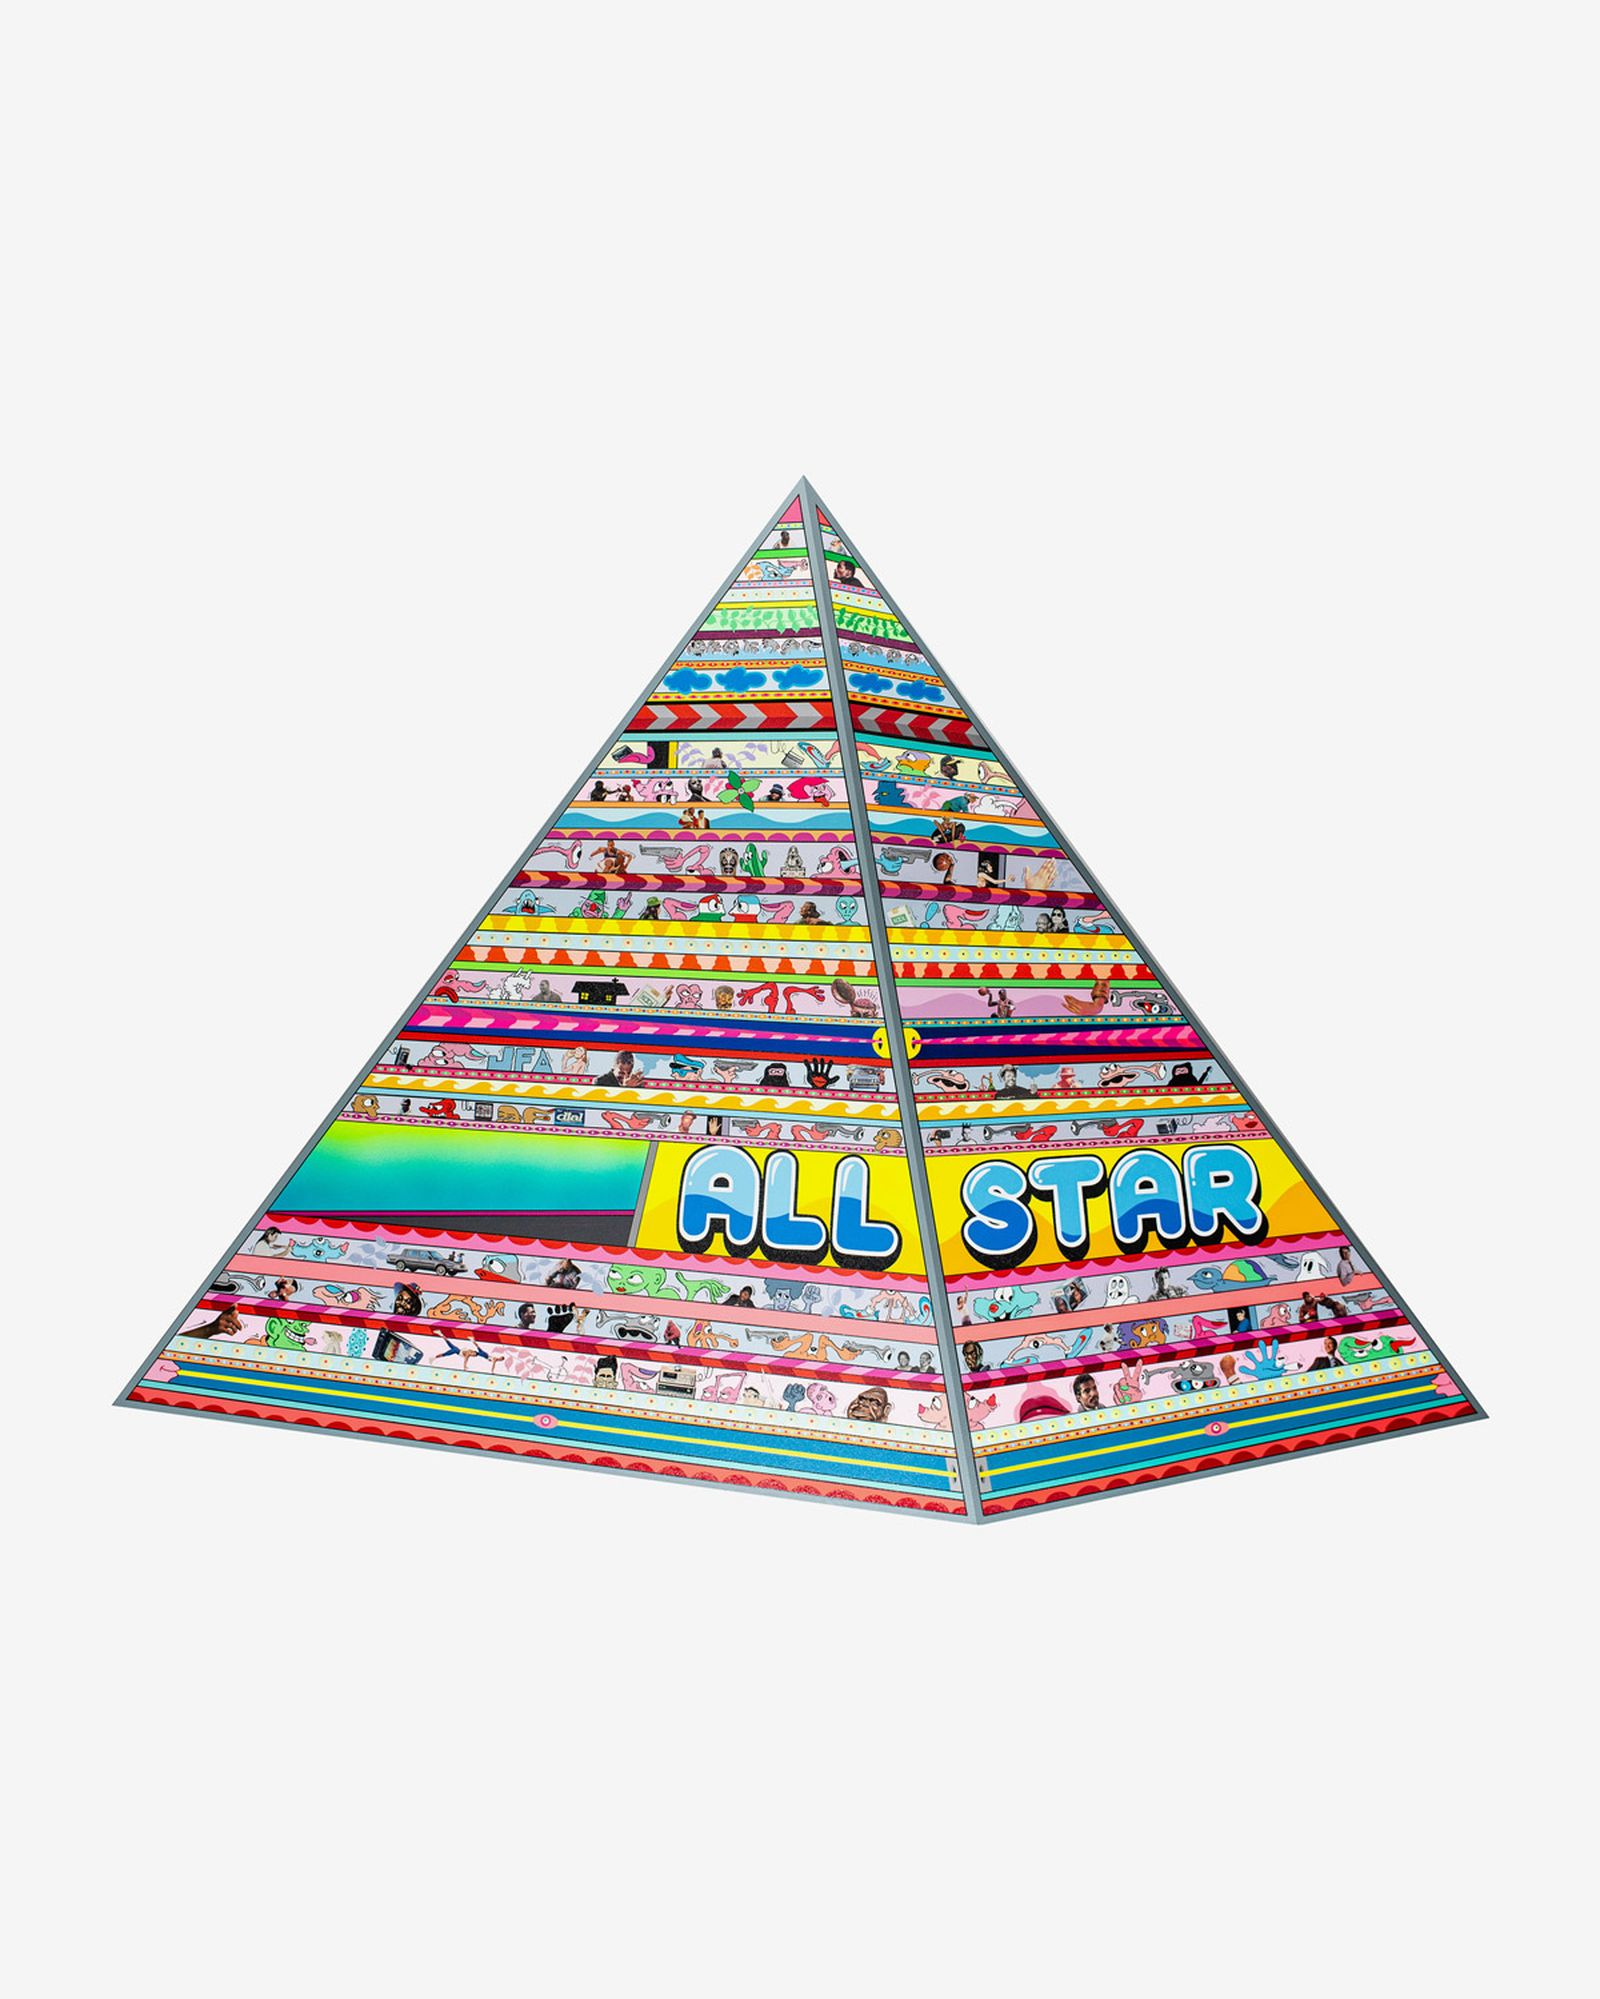 gallery-anthony-easy-otabor-06